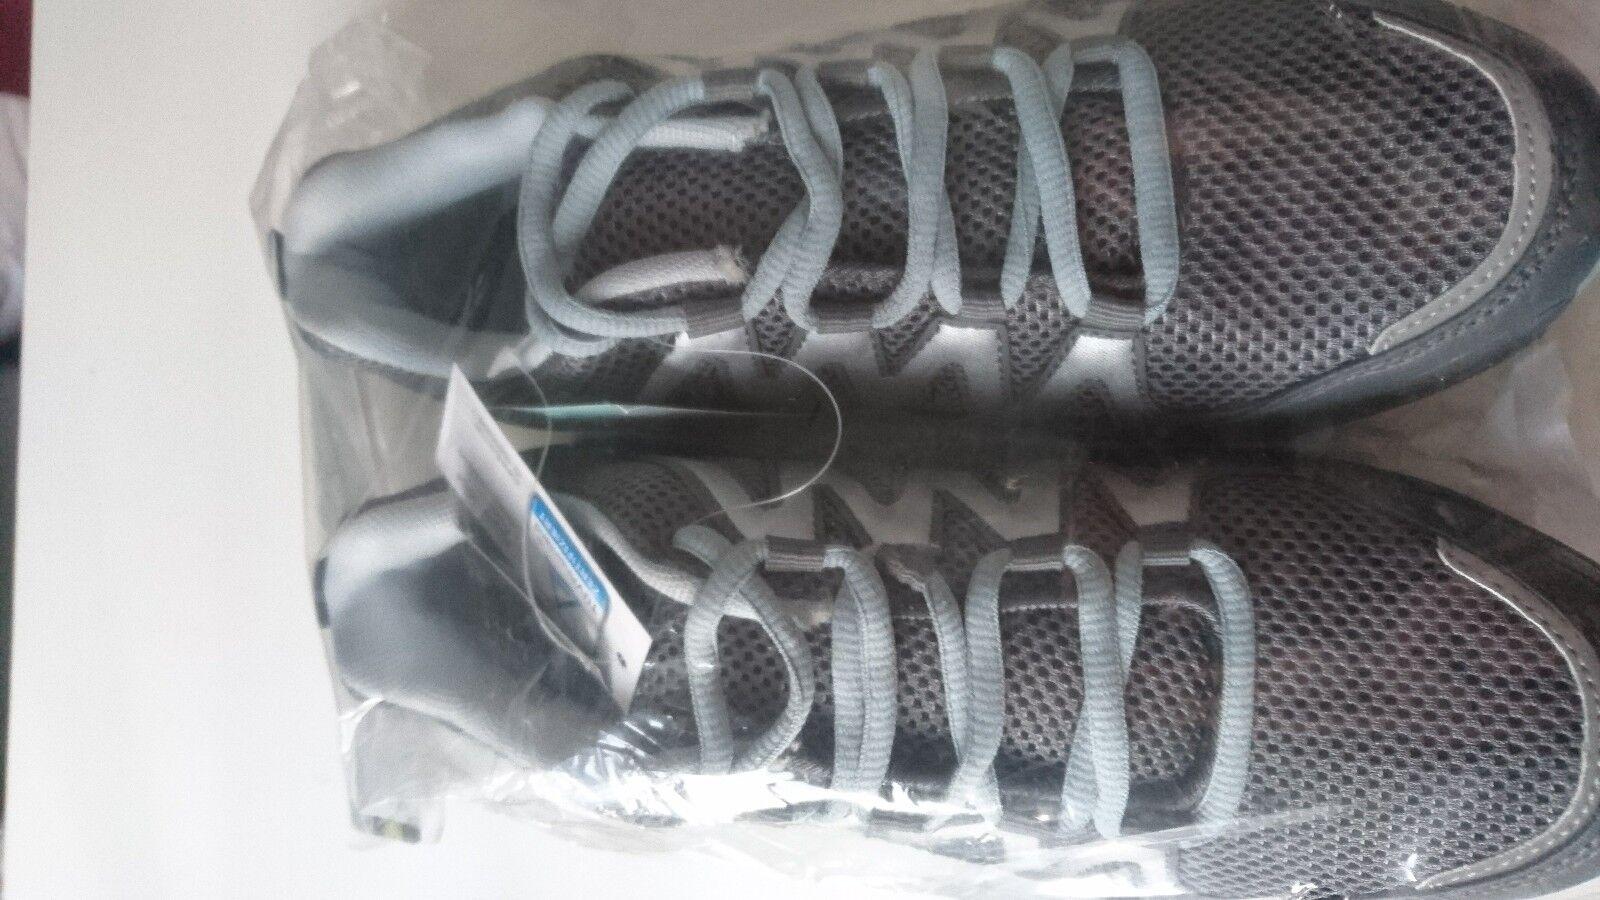 CRANE  Damen Walkingschuhe Sportschuhe Gr. 40 grau silber 3M Reflectoren NEU/OVP